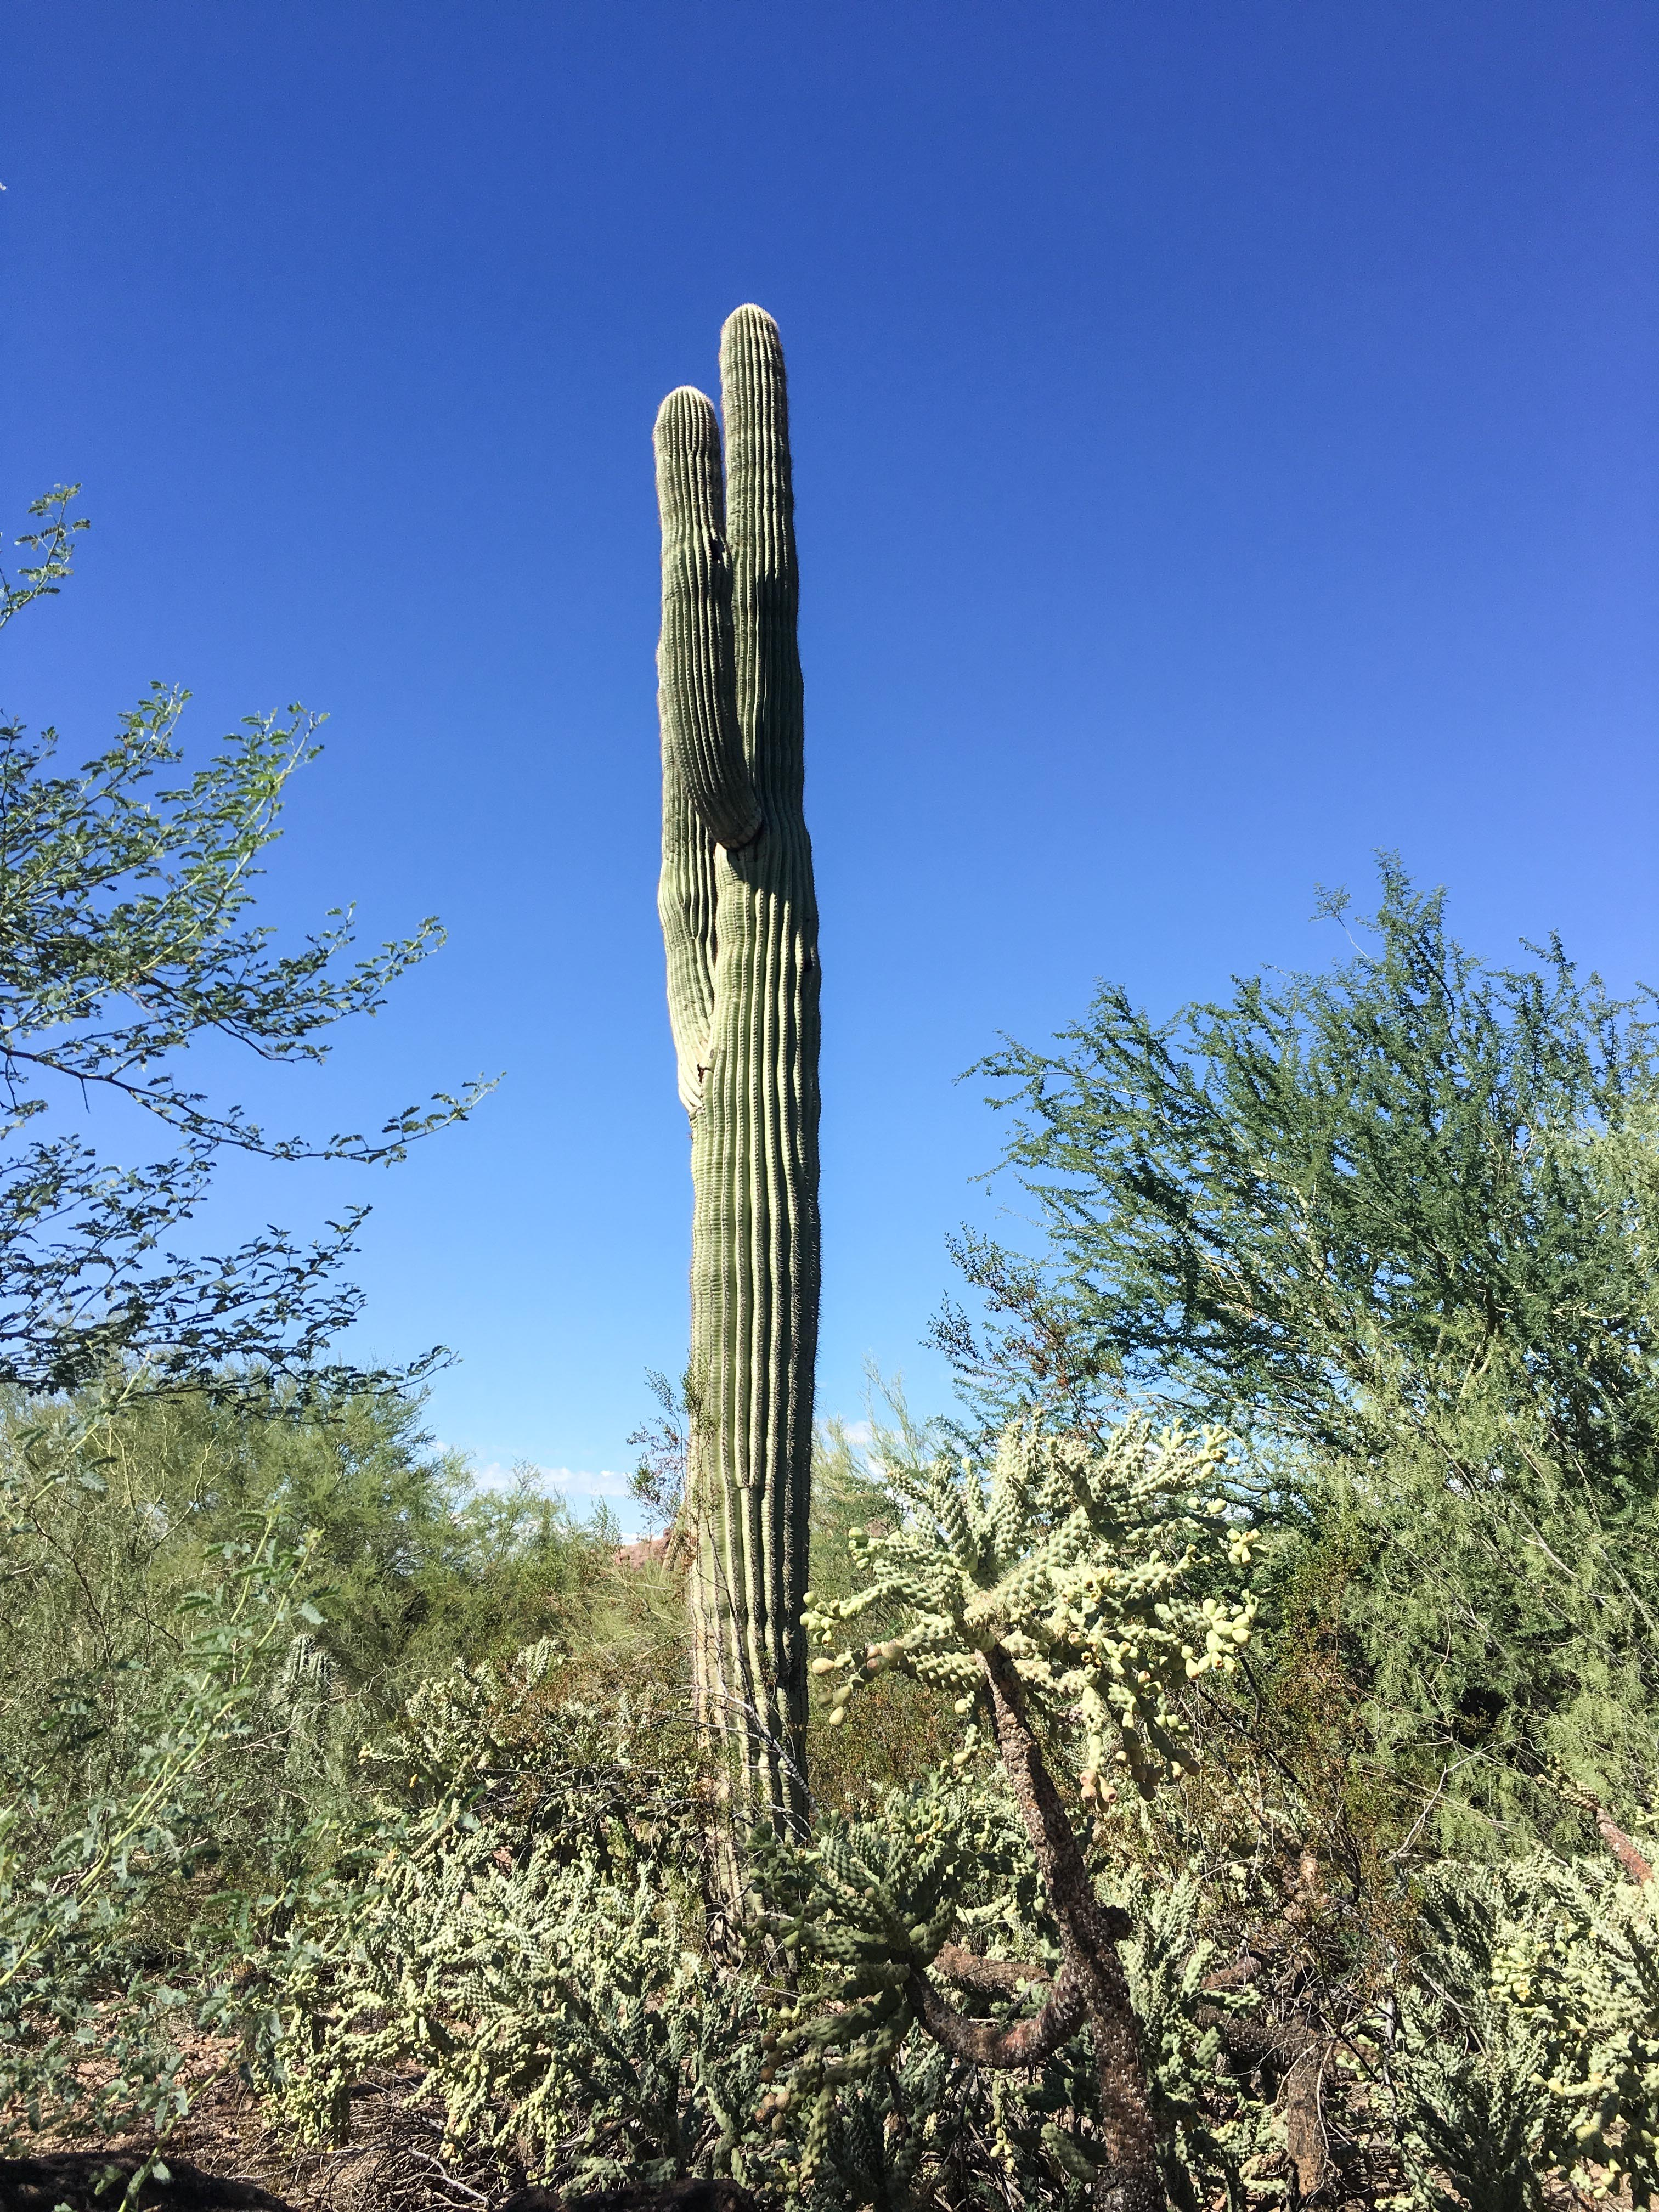 Kaktus in Arizona.